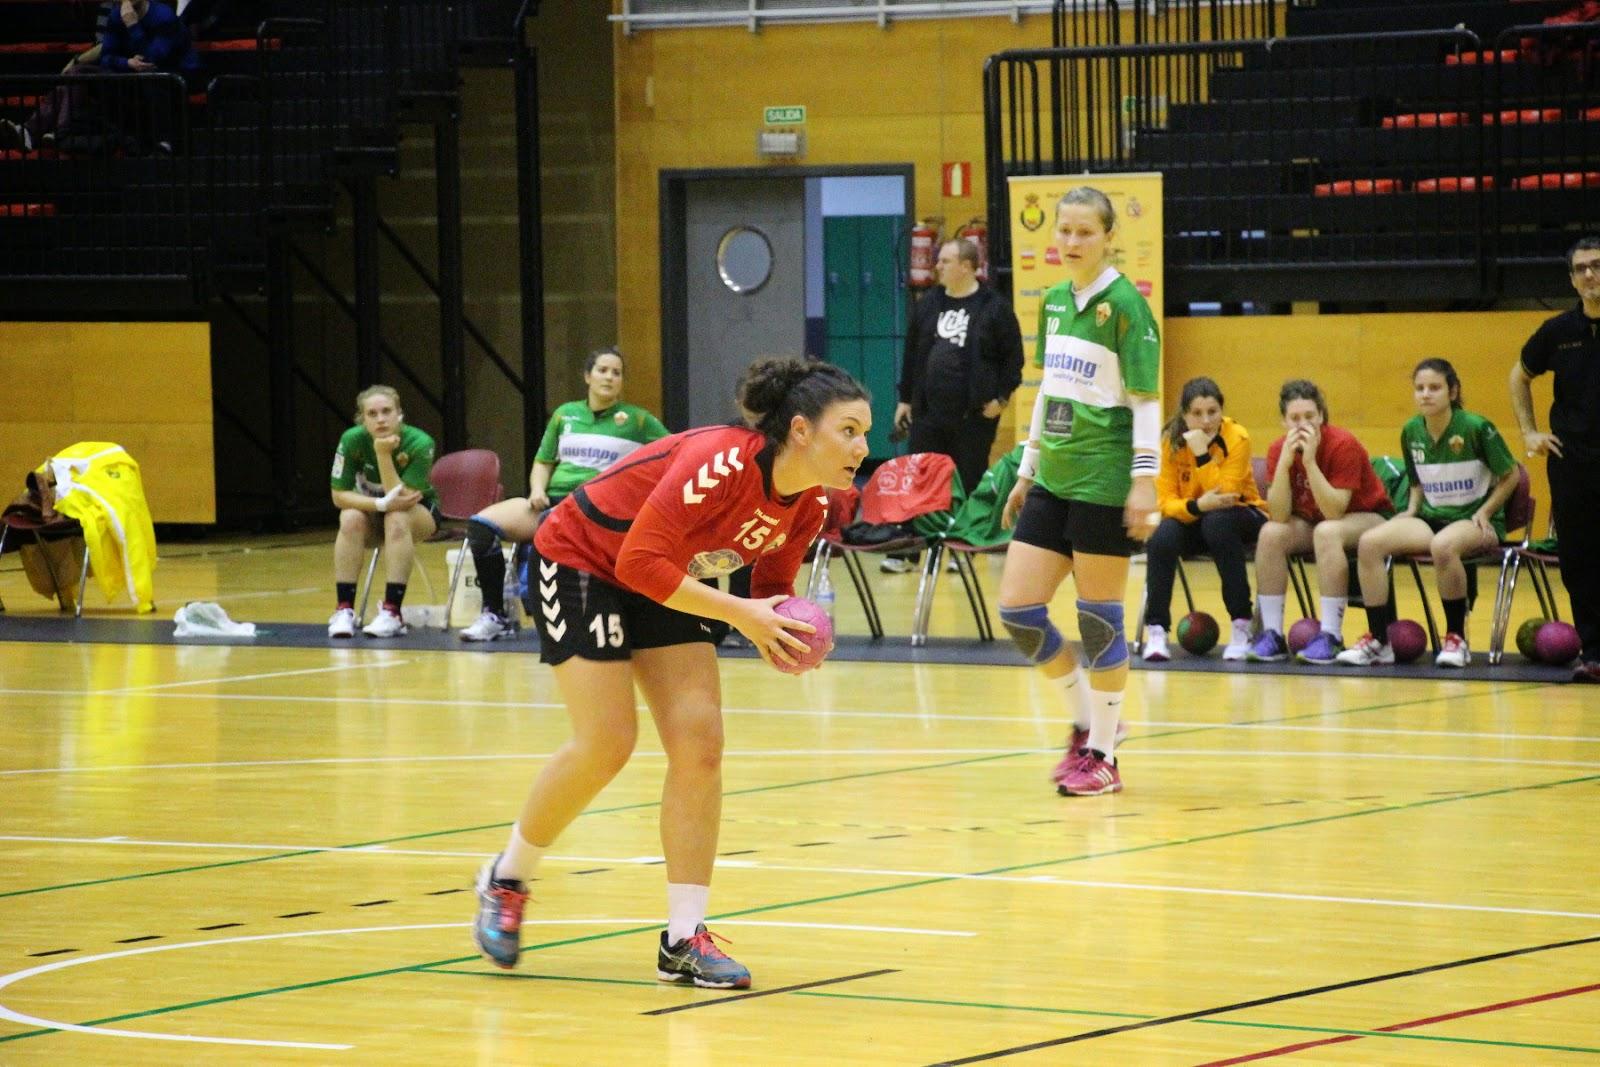 Balonmano femenino. Zuazo vs Elche